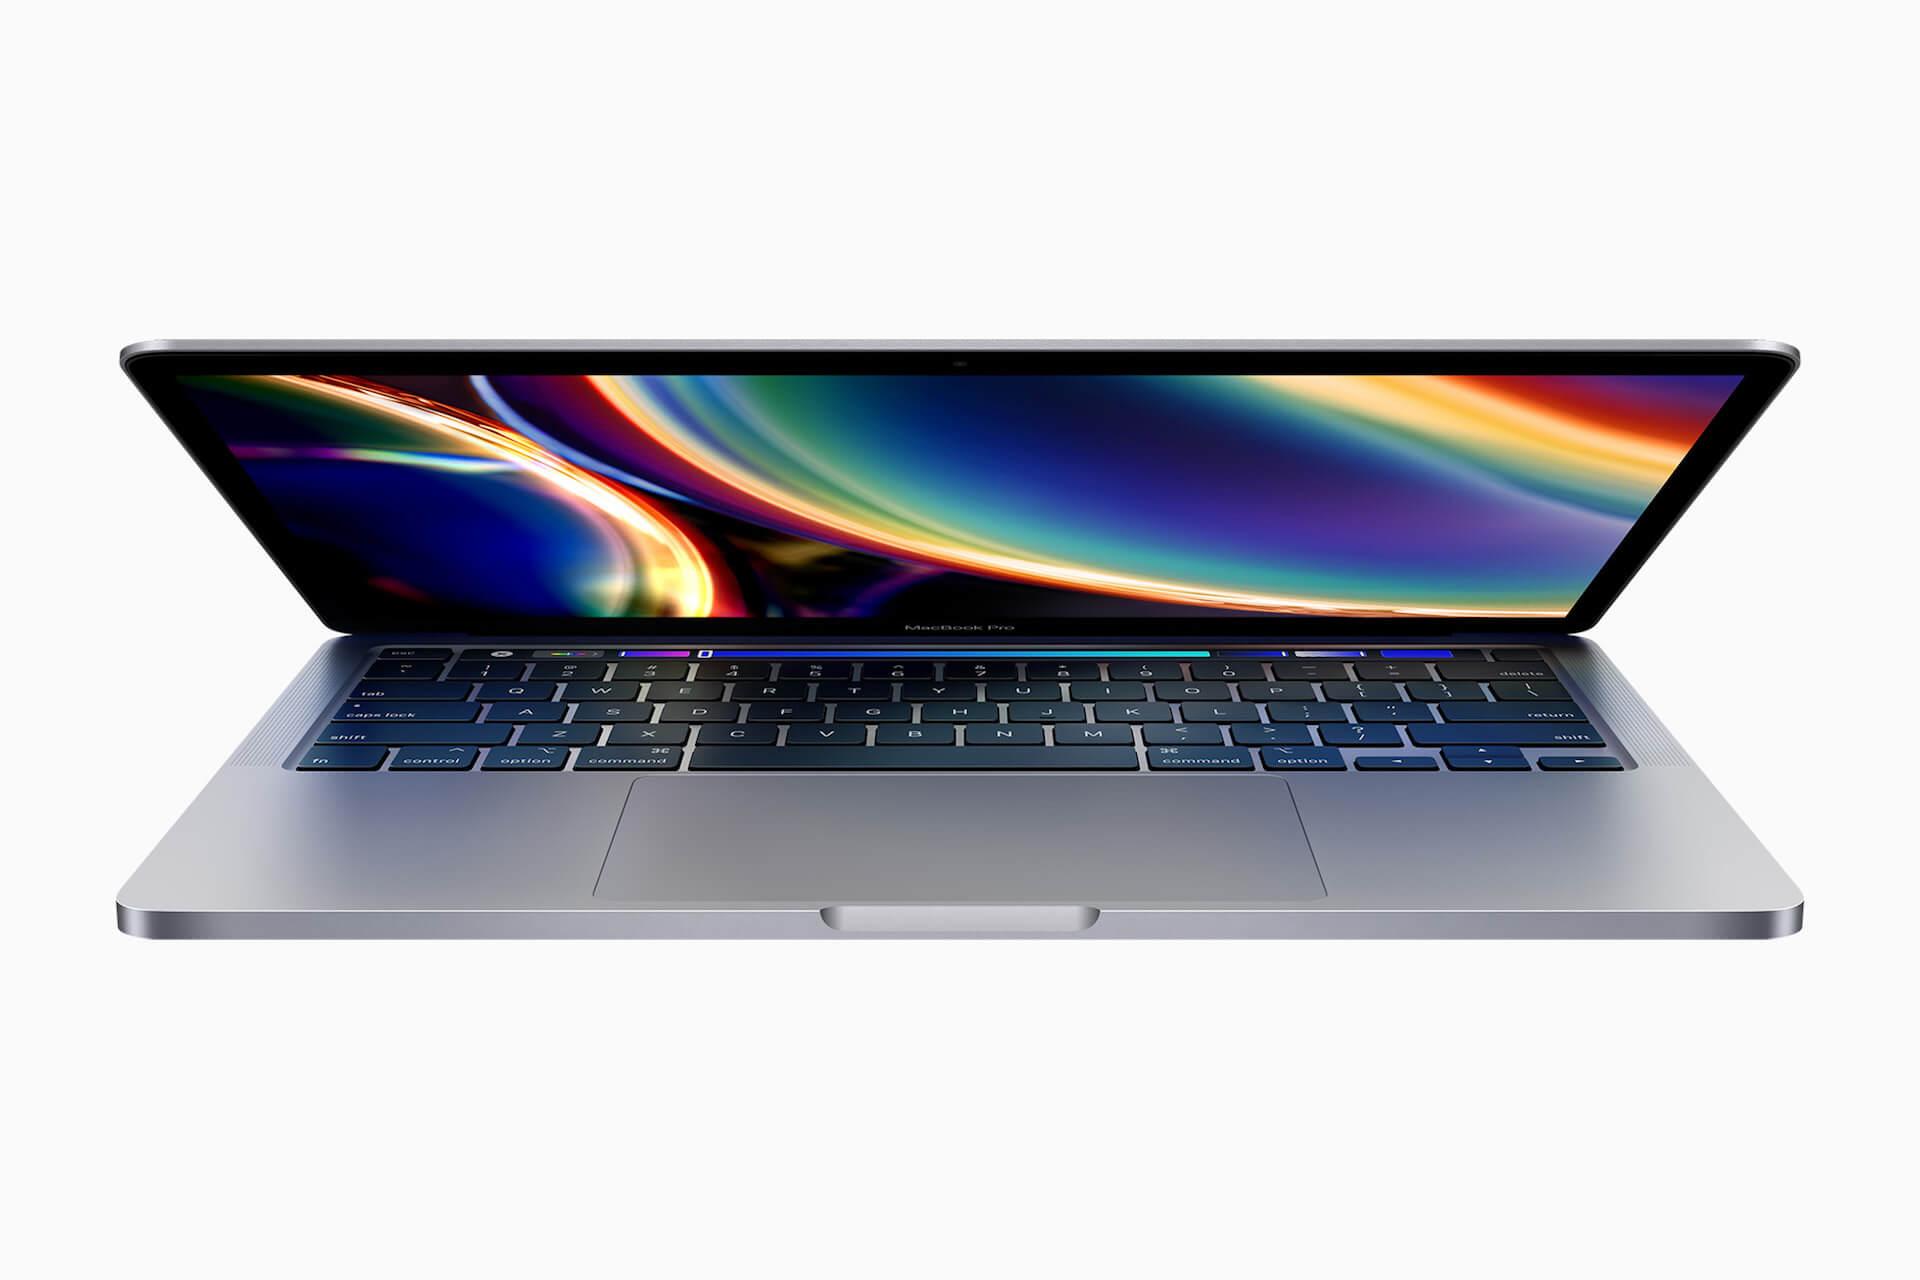 MacBook Proにやはり新サイズ登場!?2021年前半に14インチMacBook Proが発表か   Qetic